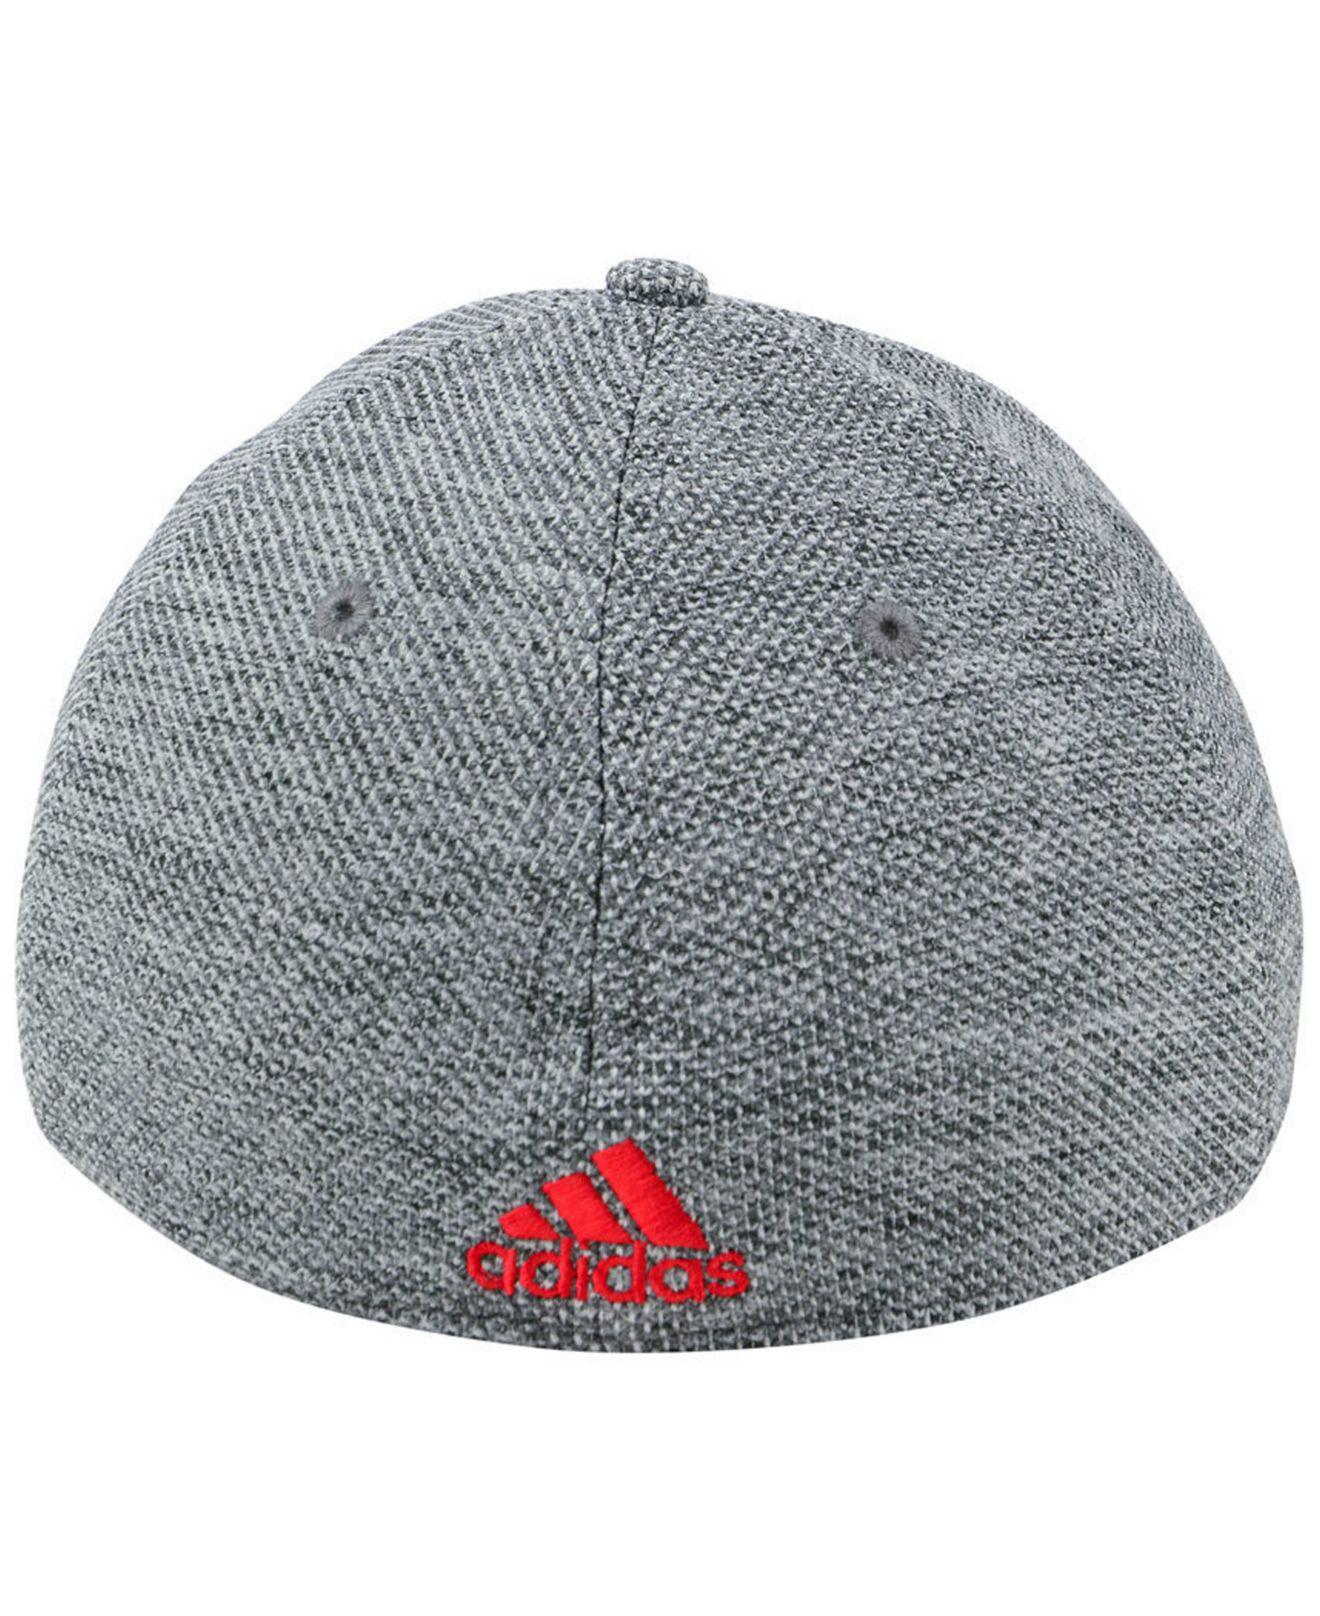 wholesale dealer c5a4e b85ca ... cheapest lyst adidas fc dallas penalty kick flex cap in gray for men  64022 ba70d